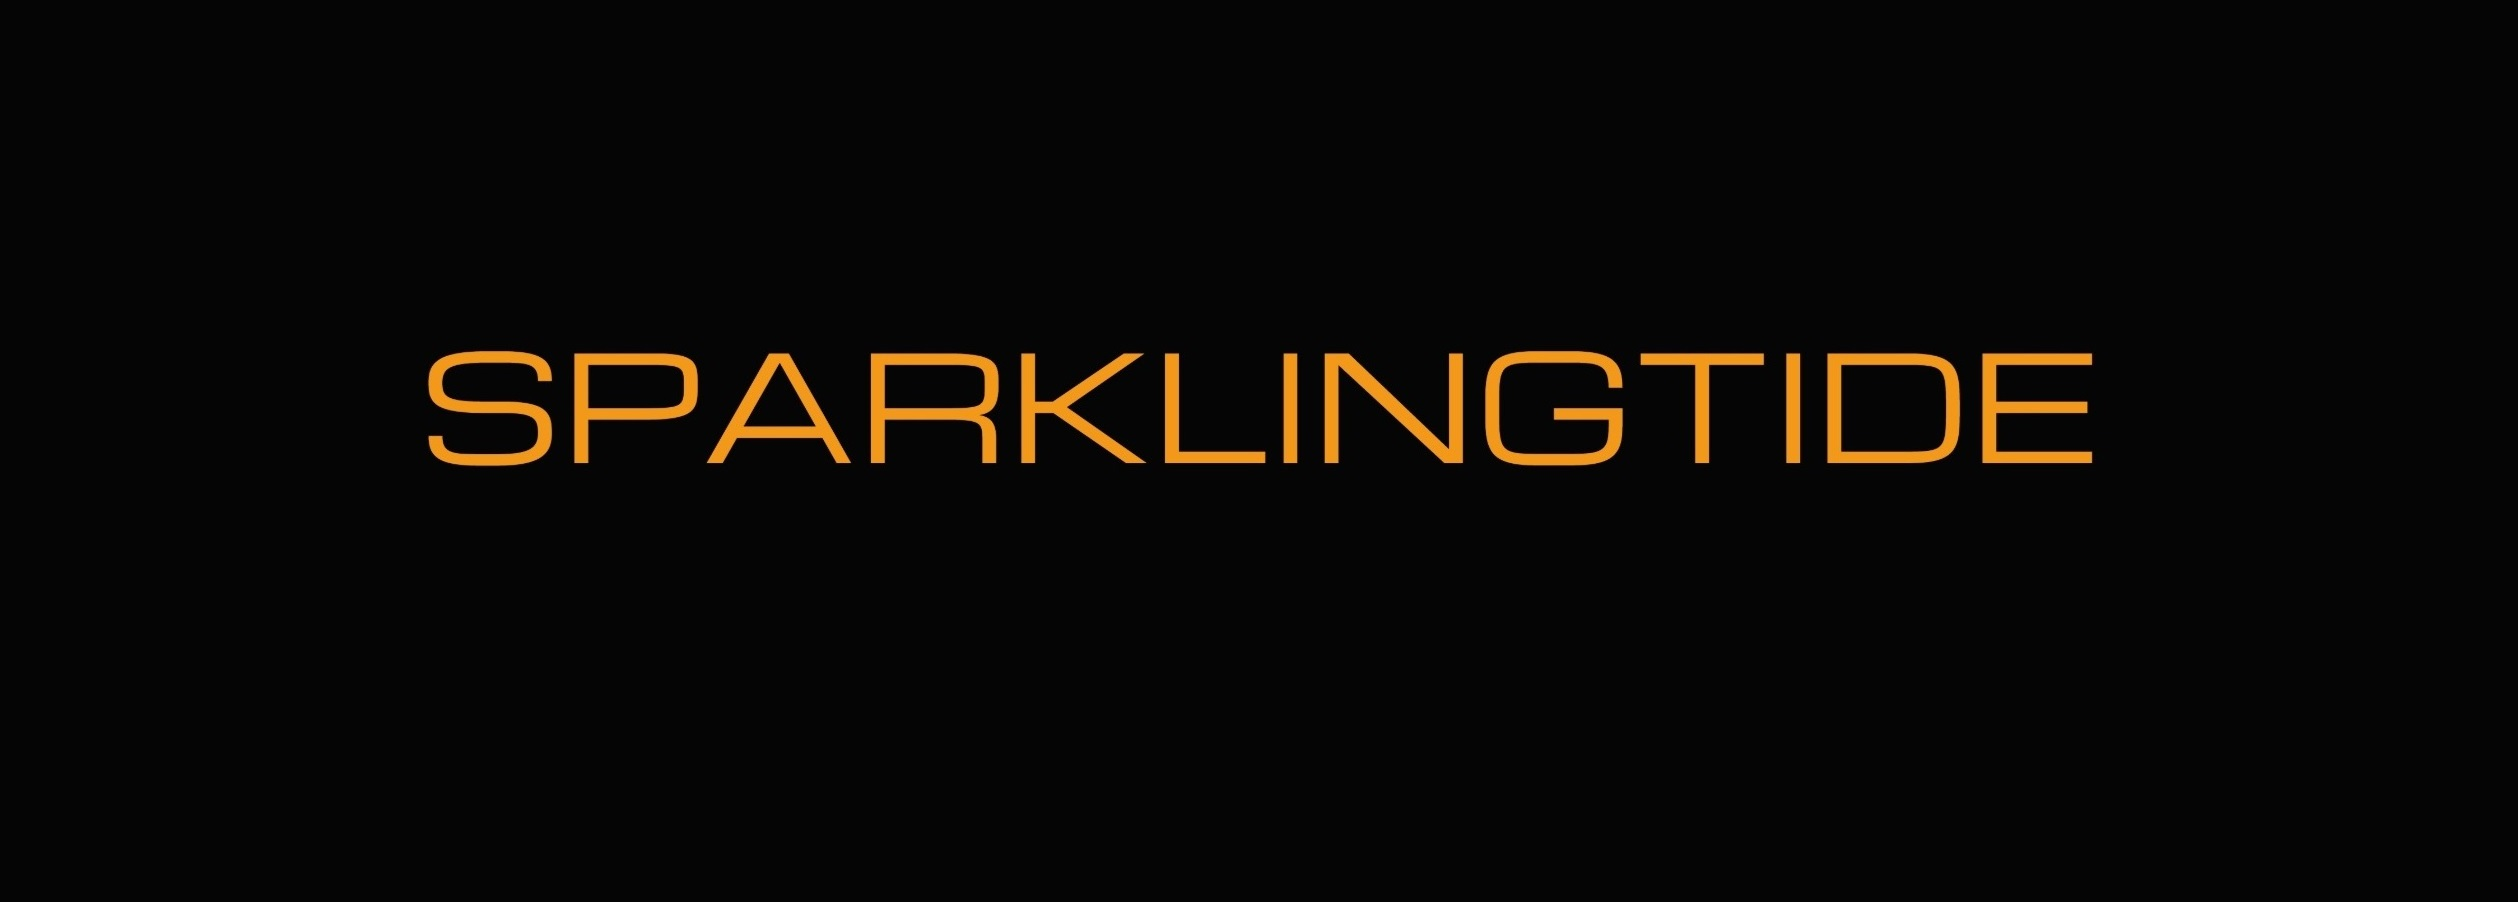 Sparklingtide Web Design (UI/UX) Russian Federation